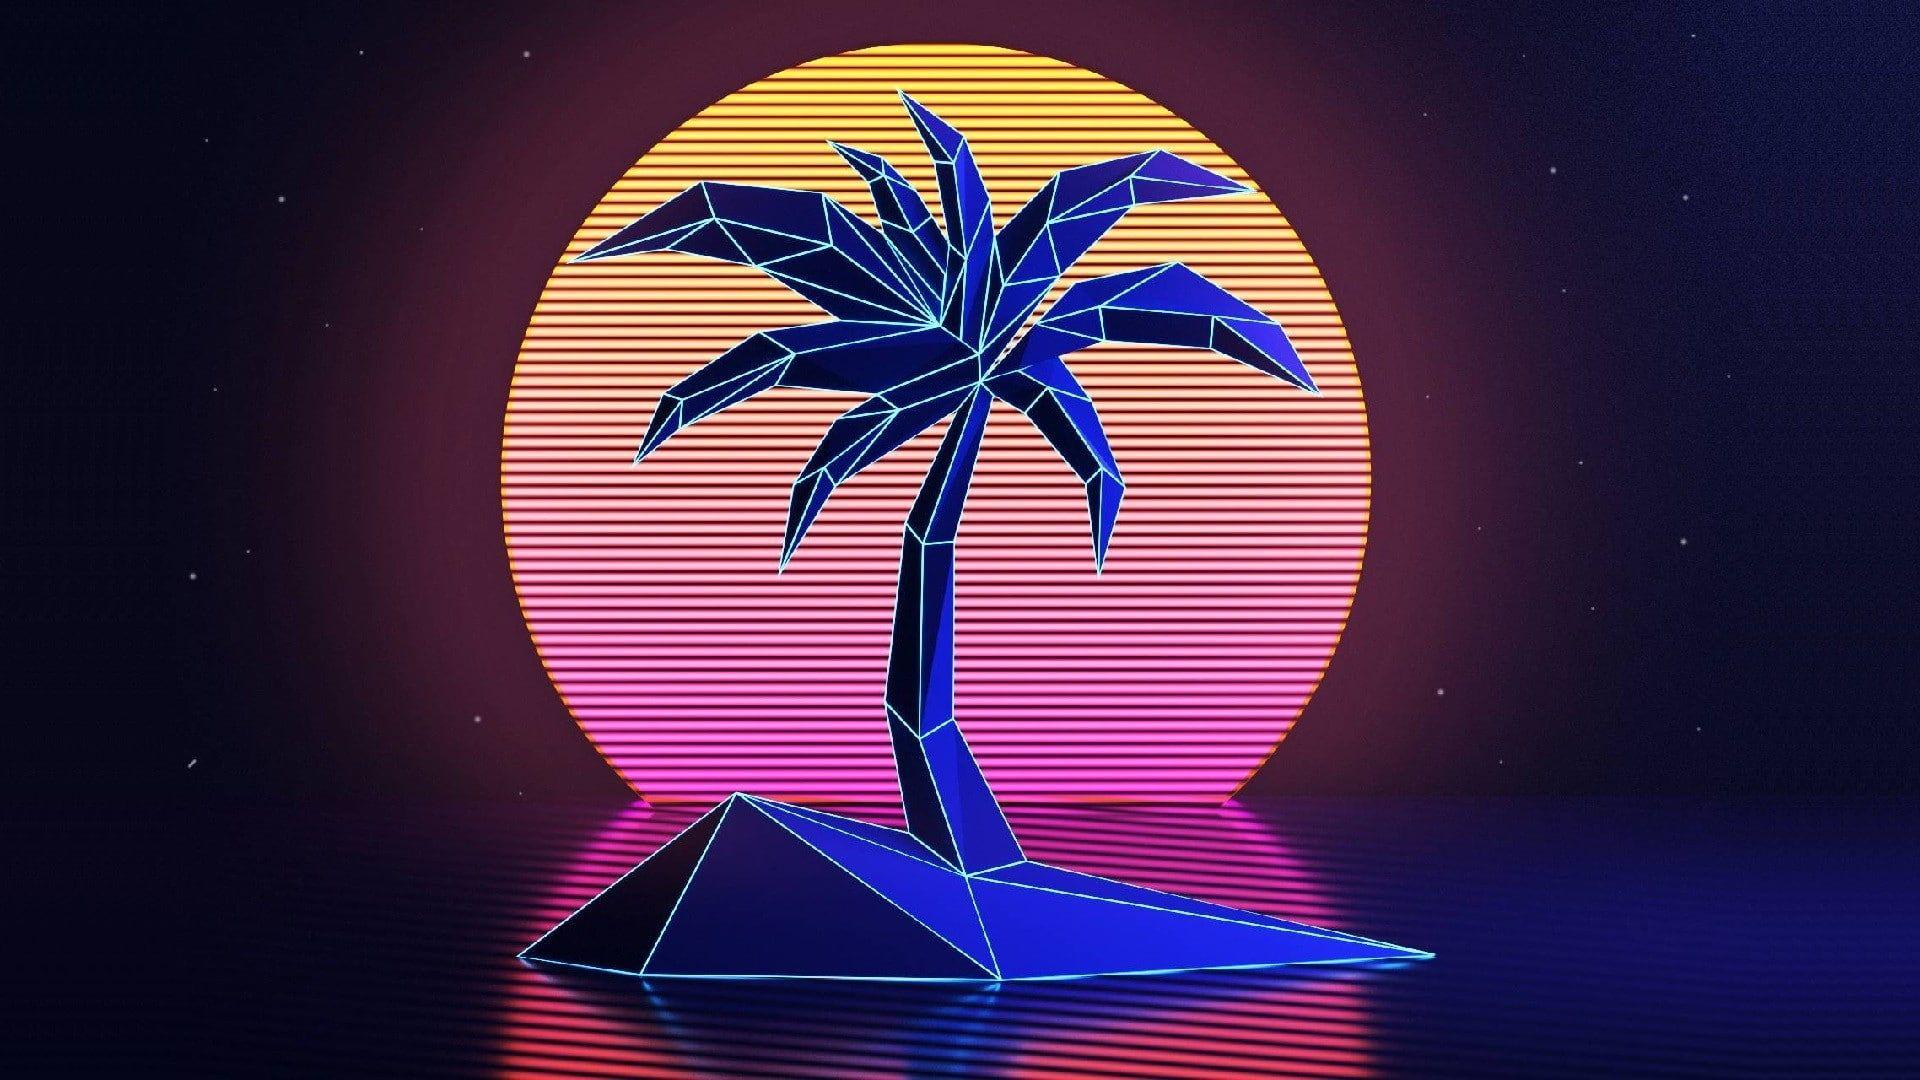 Vhs Palm Trees Vintage Retro Style Sunset Neon 1980s New Retro Wave 1080p Wallpaper Hdwallpaper Desktop In 2020 Neon Wallpaper Neon Backgrounds Retro Waves